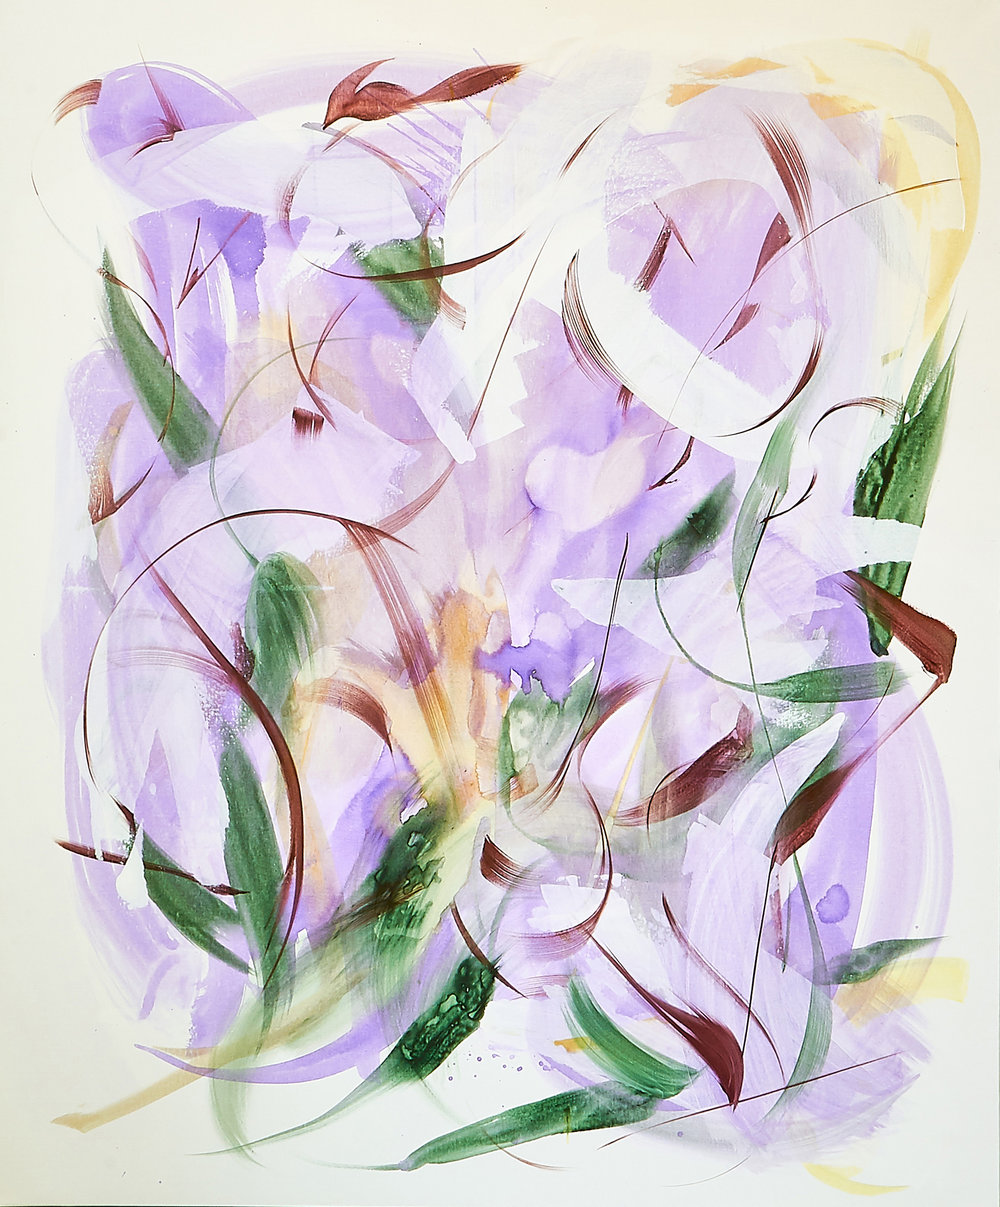 Huang Yanyan   Purple Poem III  2019 Acrylic on Canvas 152.4 x 182.9 cm  Available